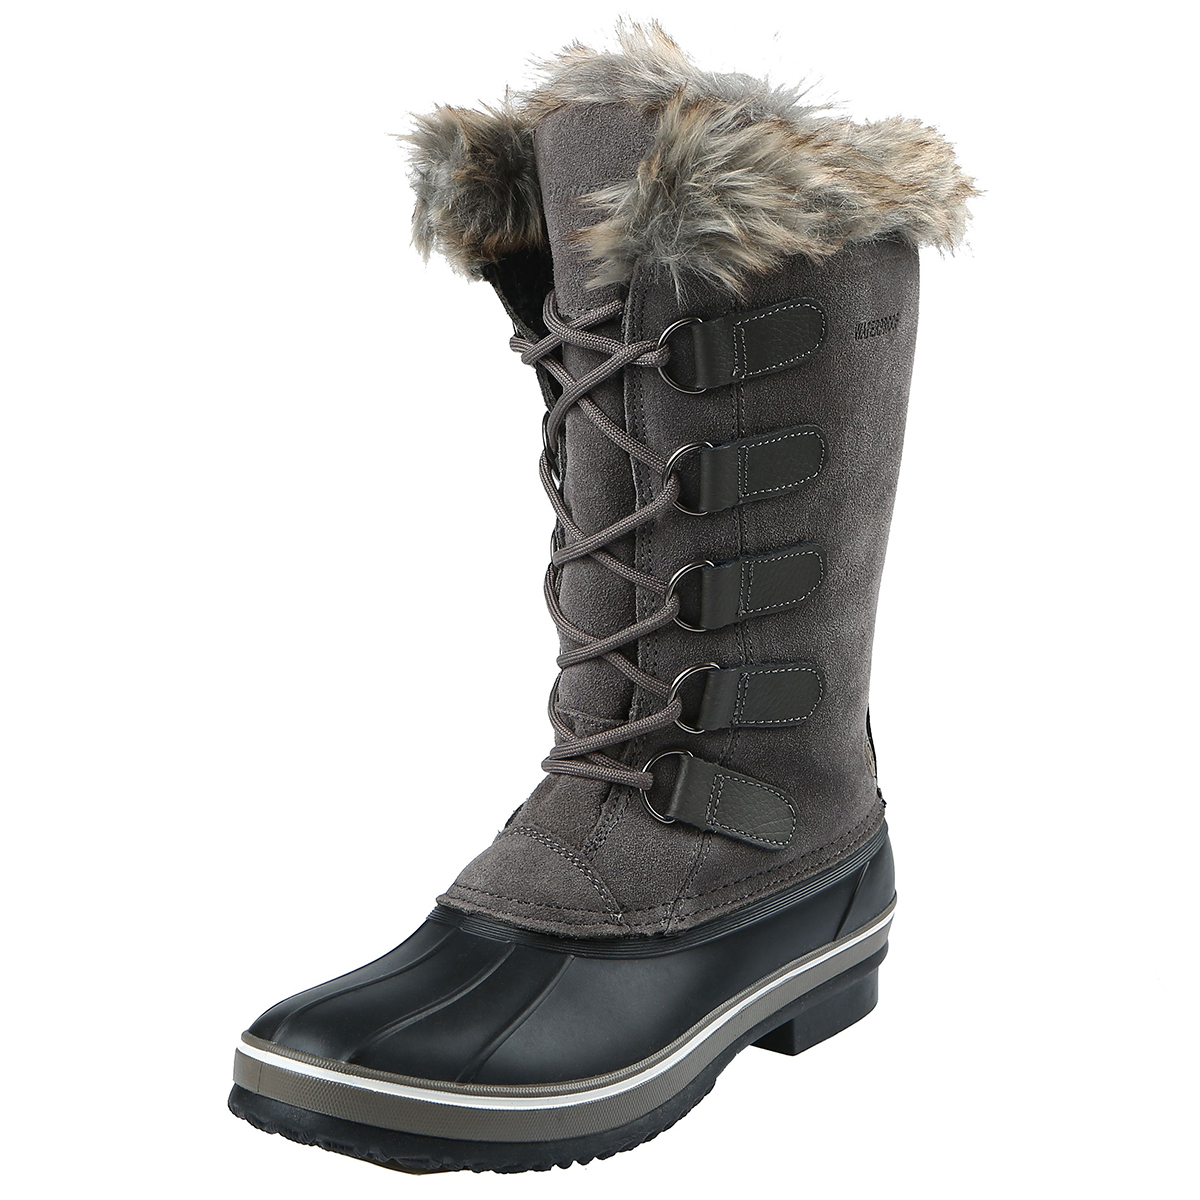 Northside Women's Kathmandu Boots - Black, 8